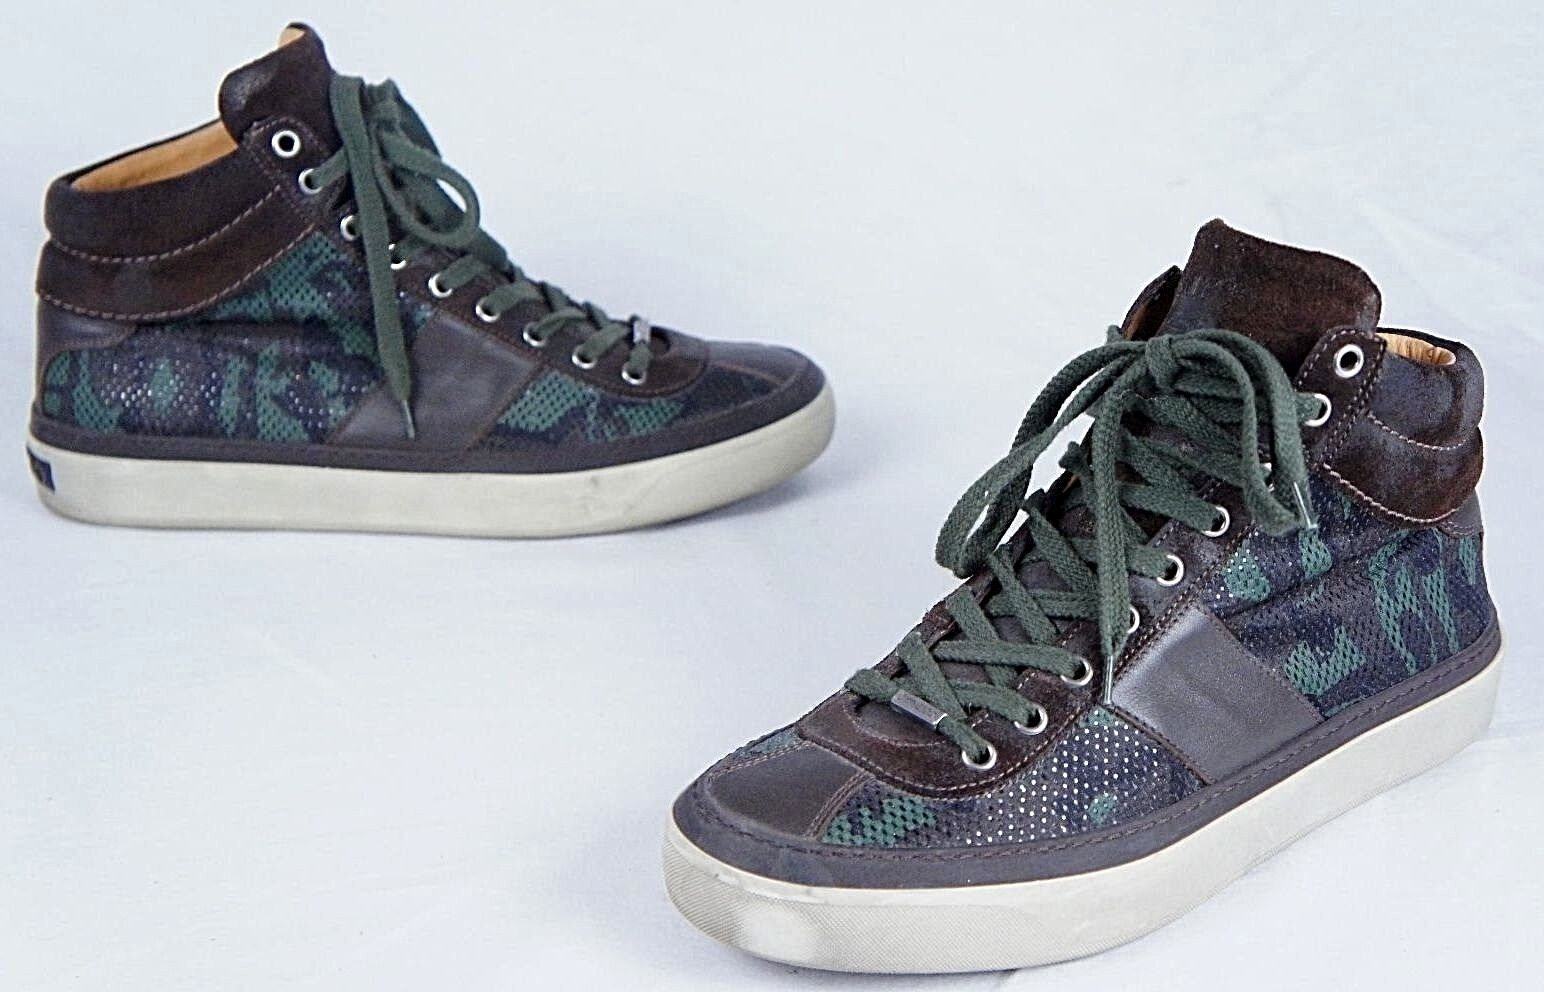 Scarpe casual da uomo  Jimmy Choo uomos Belgravia Green Camo Glitter High-Top Sneakers (42.5EU/9.5US)